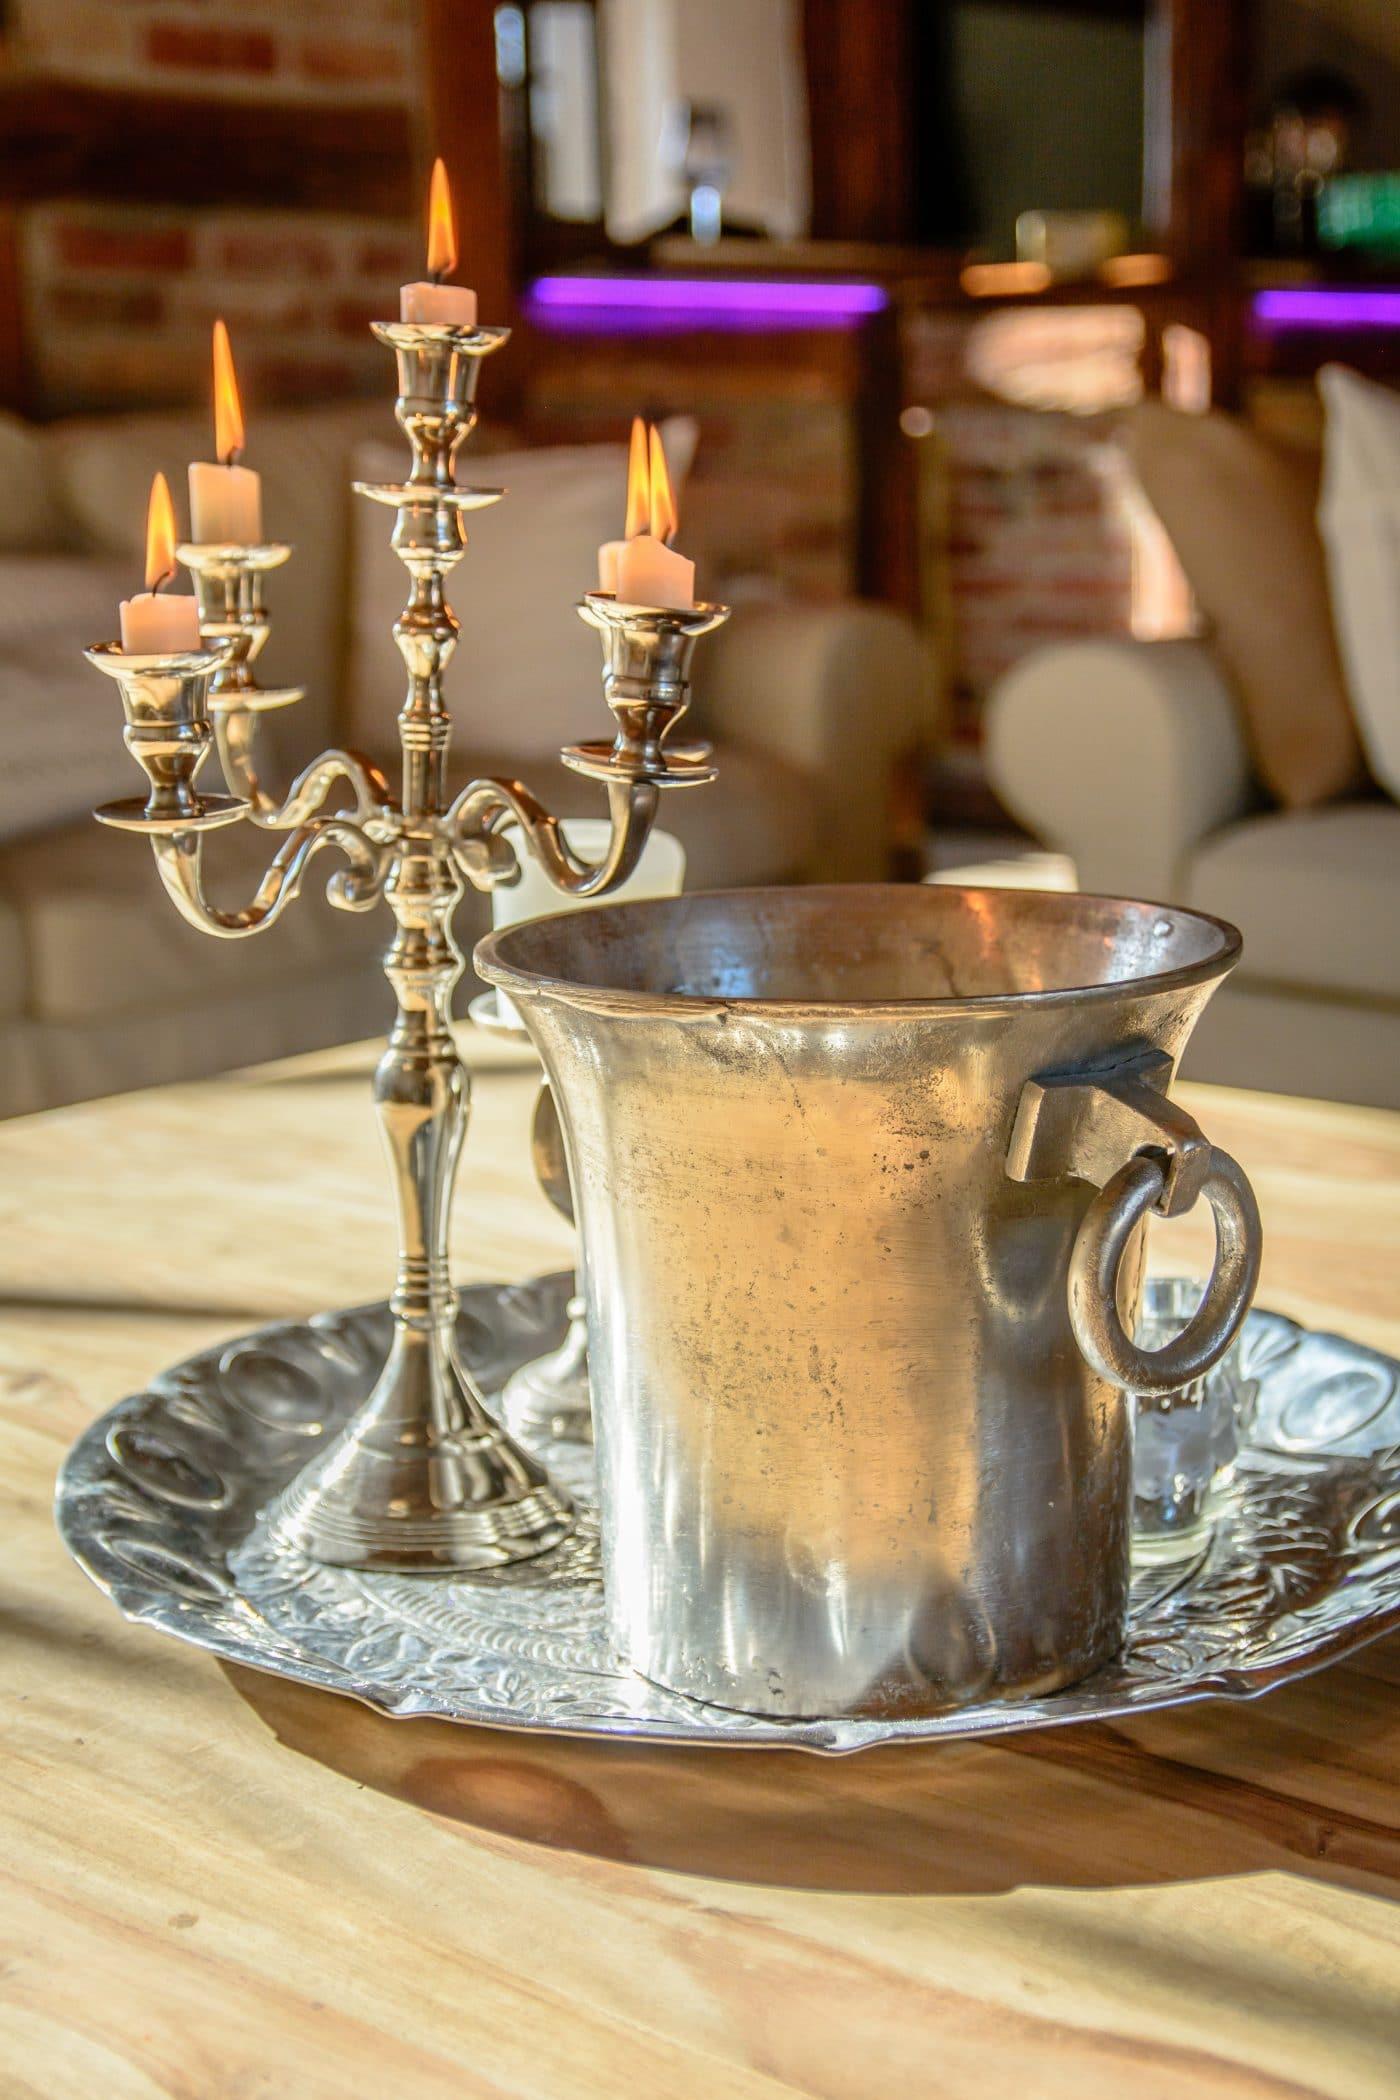 Messingbecher und Kerzen